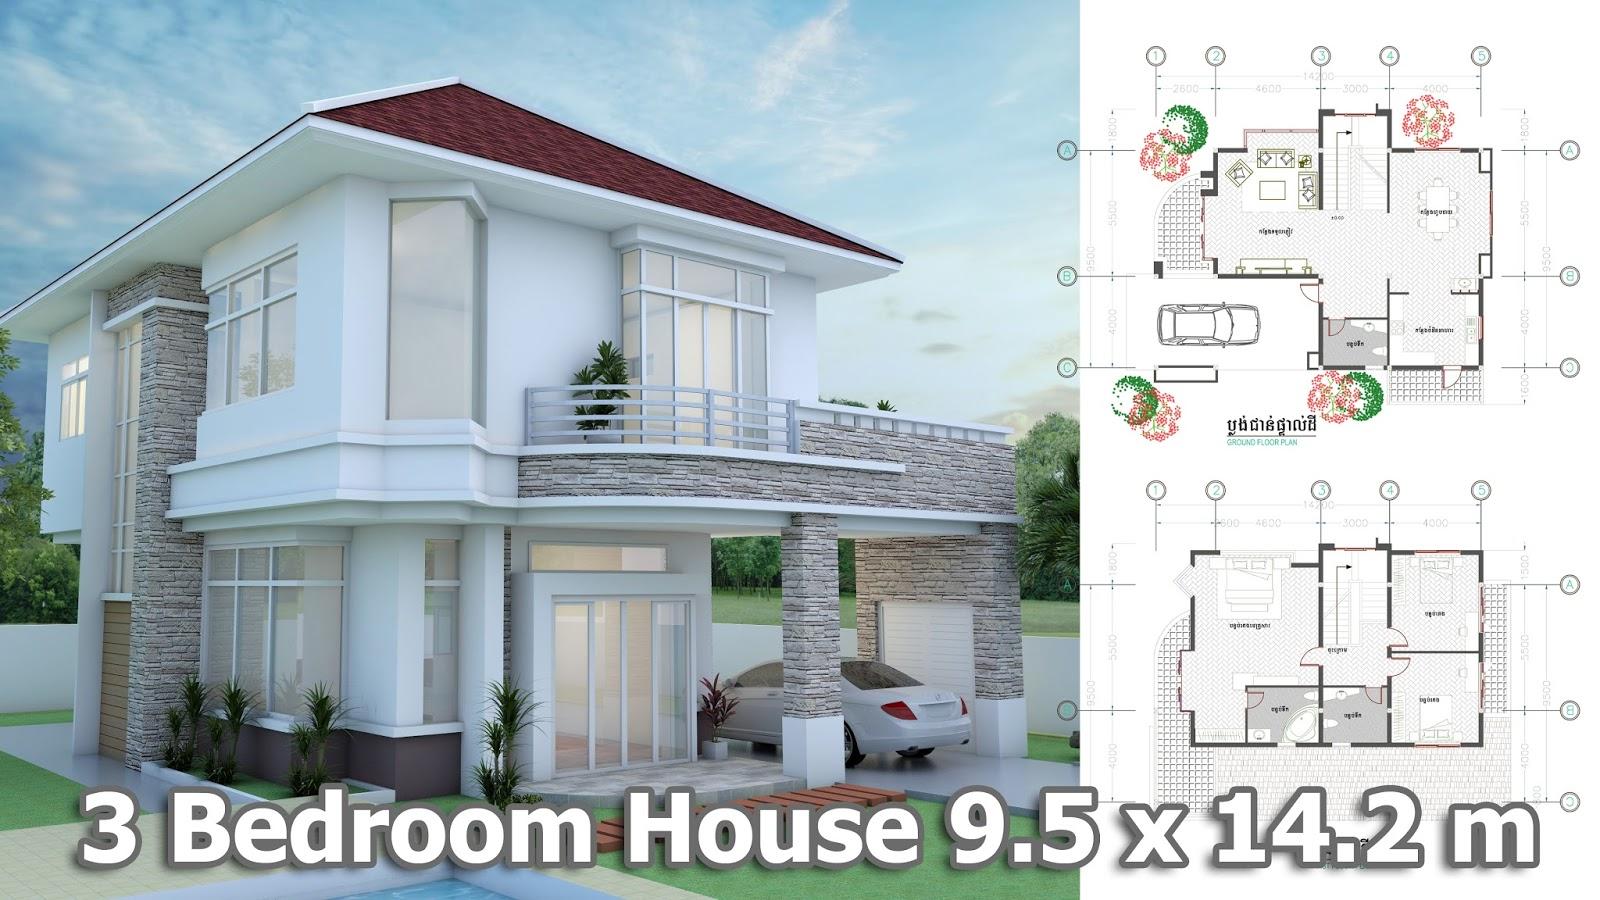 Modern Home Plan 9m5 x 14m2 Free Pdf AutoCad SketchUp ...